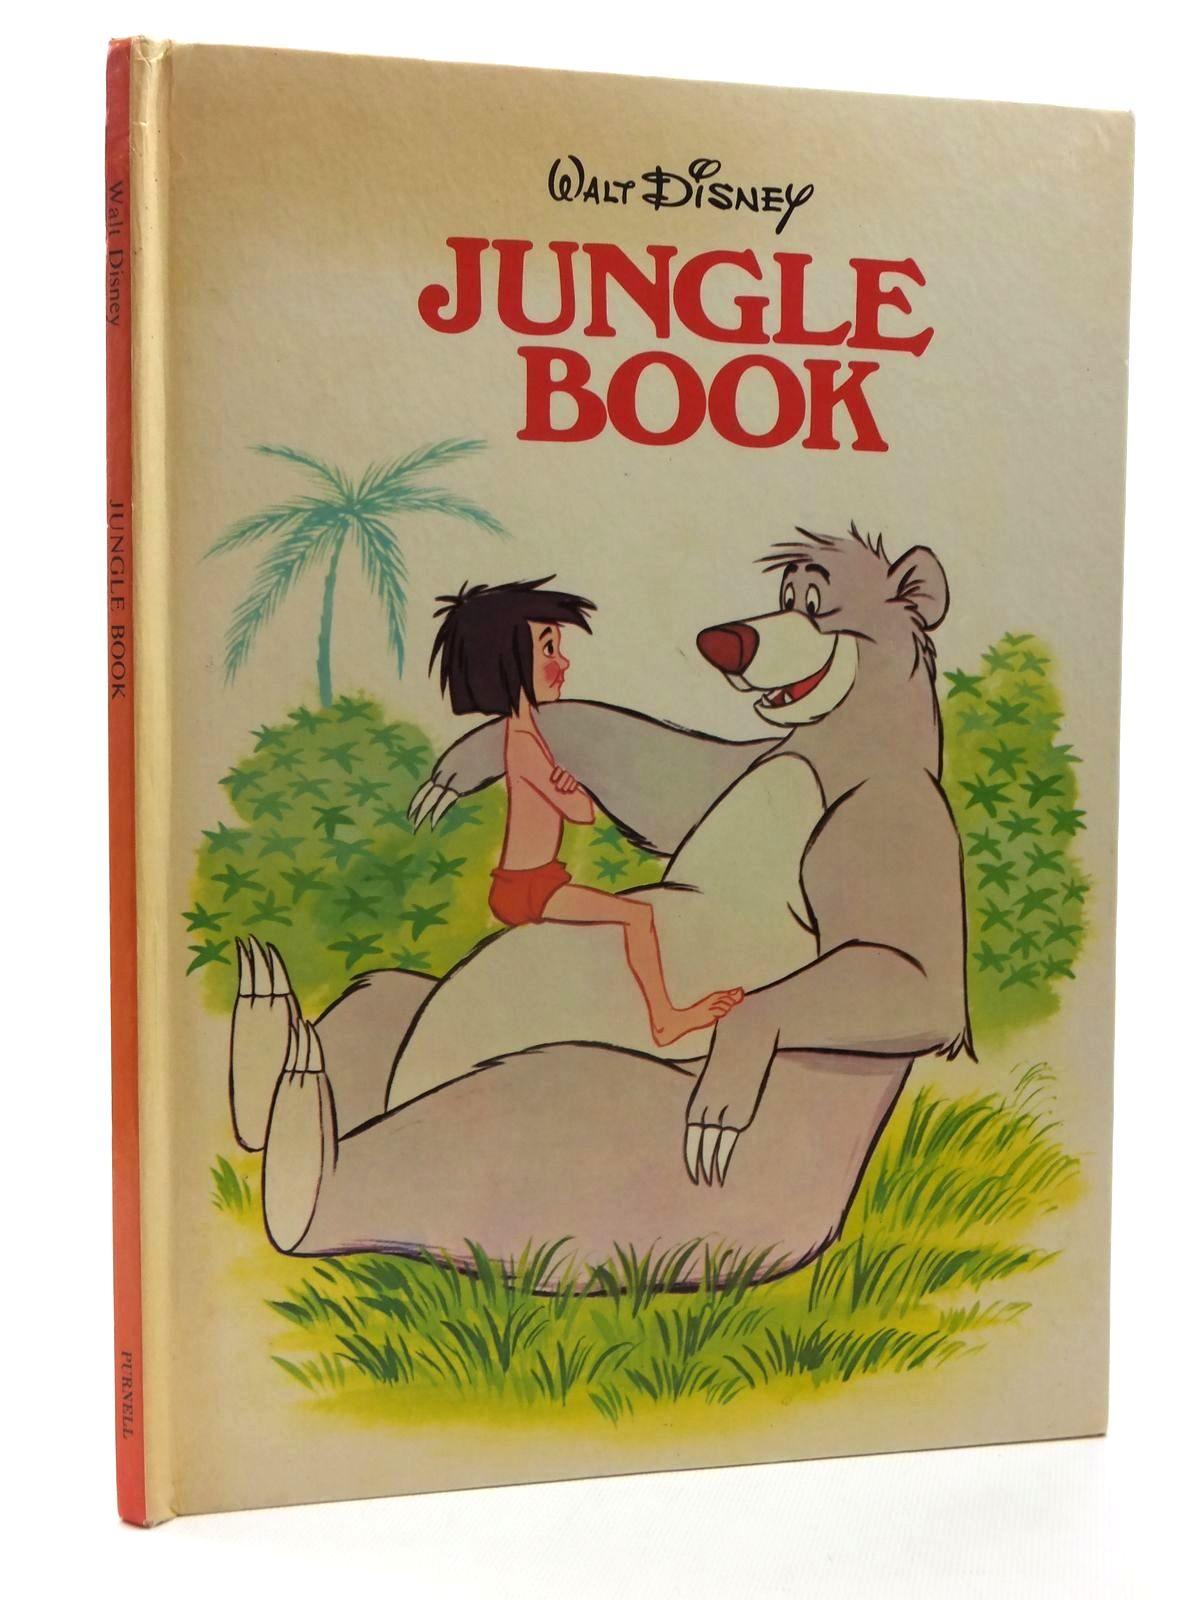 Photo of WALT DISNEY JUNGLE BOOK written by Disney, Walt Kipling, Rudyard published by Purnell (STOCK CODE: 2124018)  for sale by Stella & Rose's Books